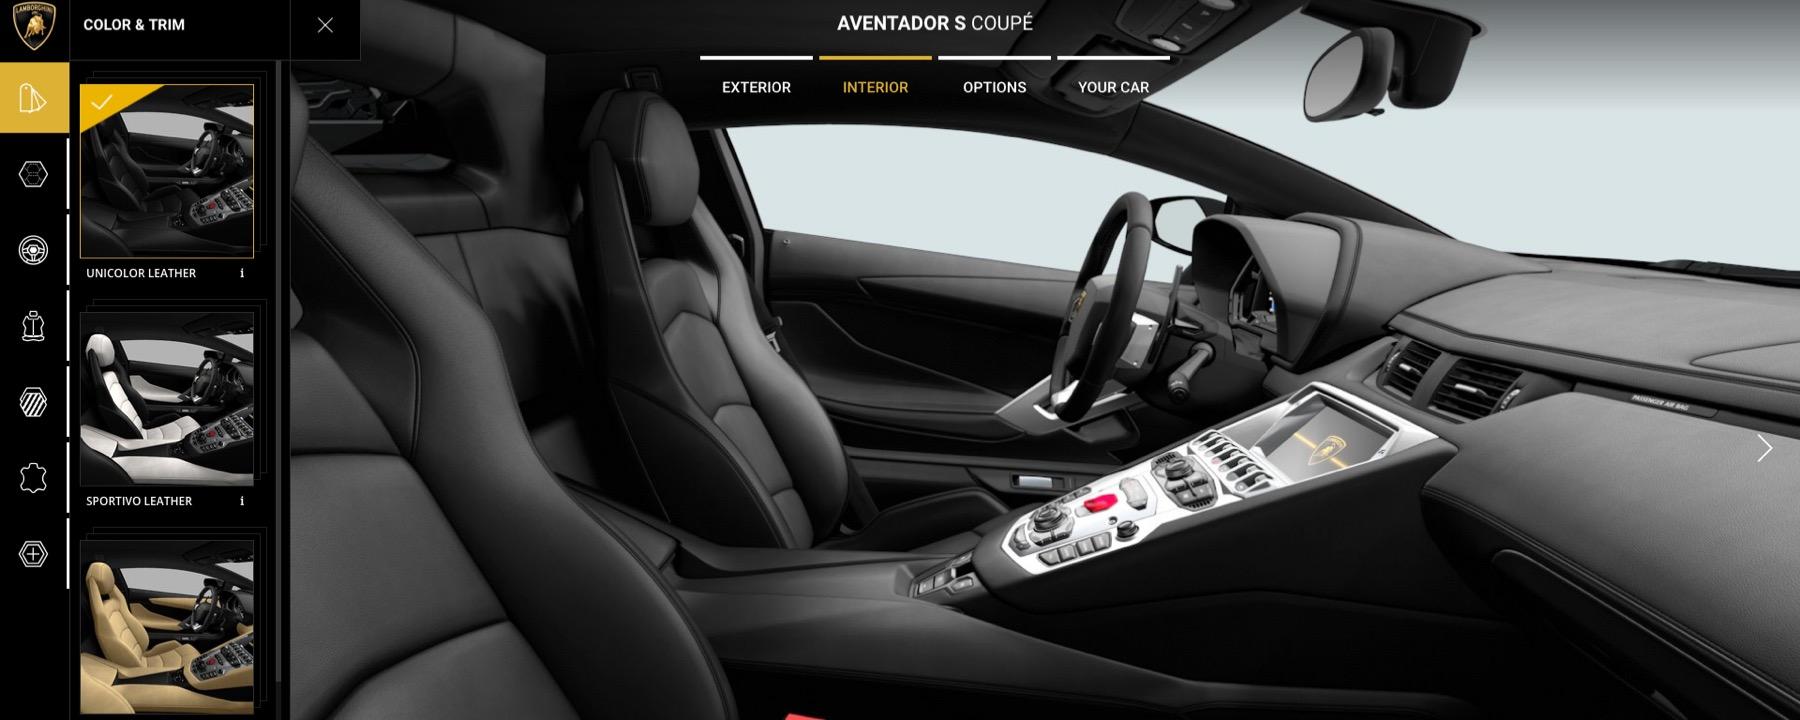 Lamborghini Houston Blog Lamborghini Houston Blog News Updates